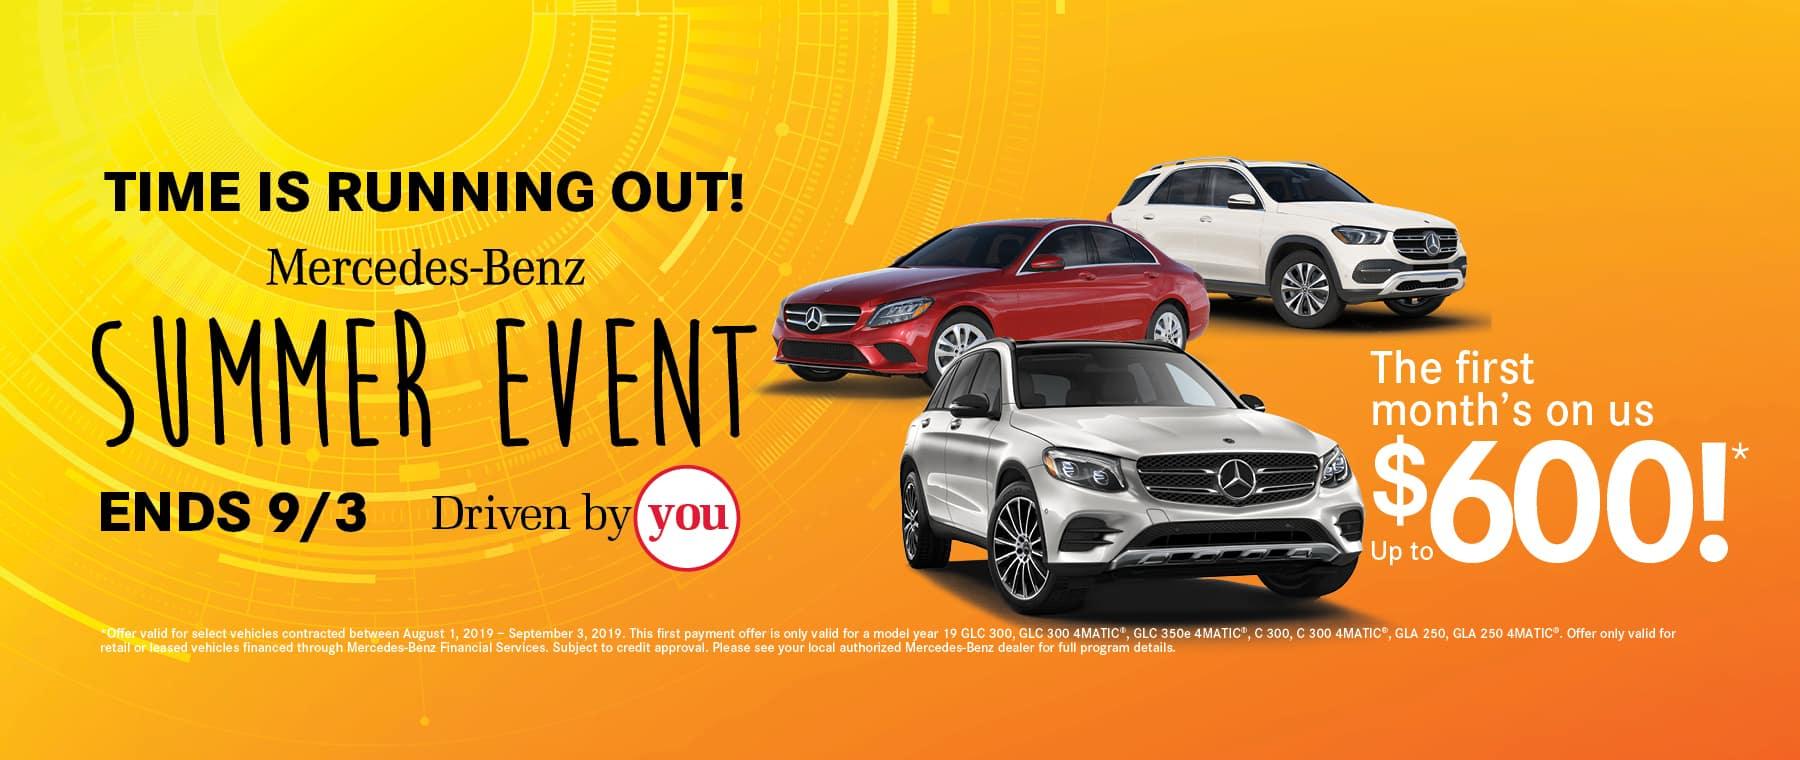 New Mercedes Benz Dealership Philadelphia Cherry Hill Nj